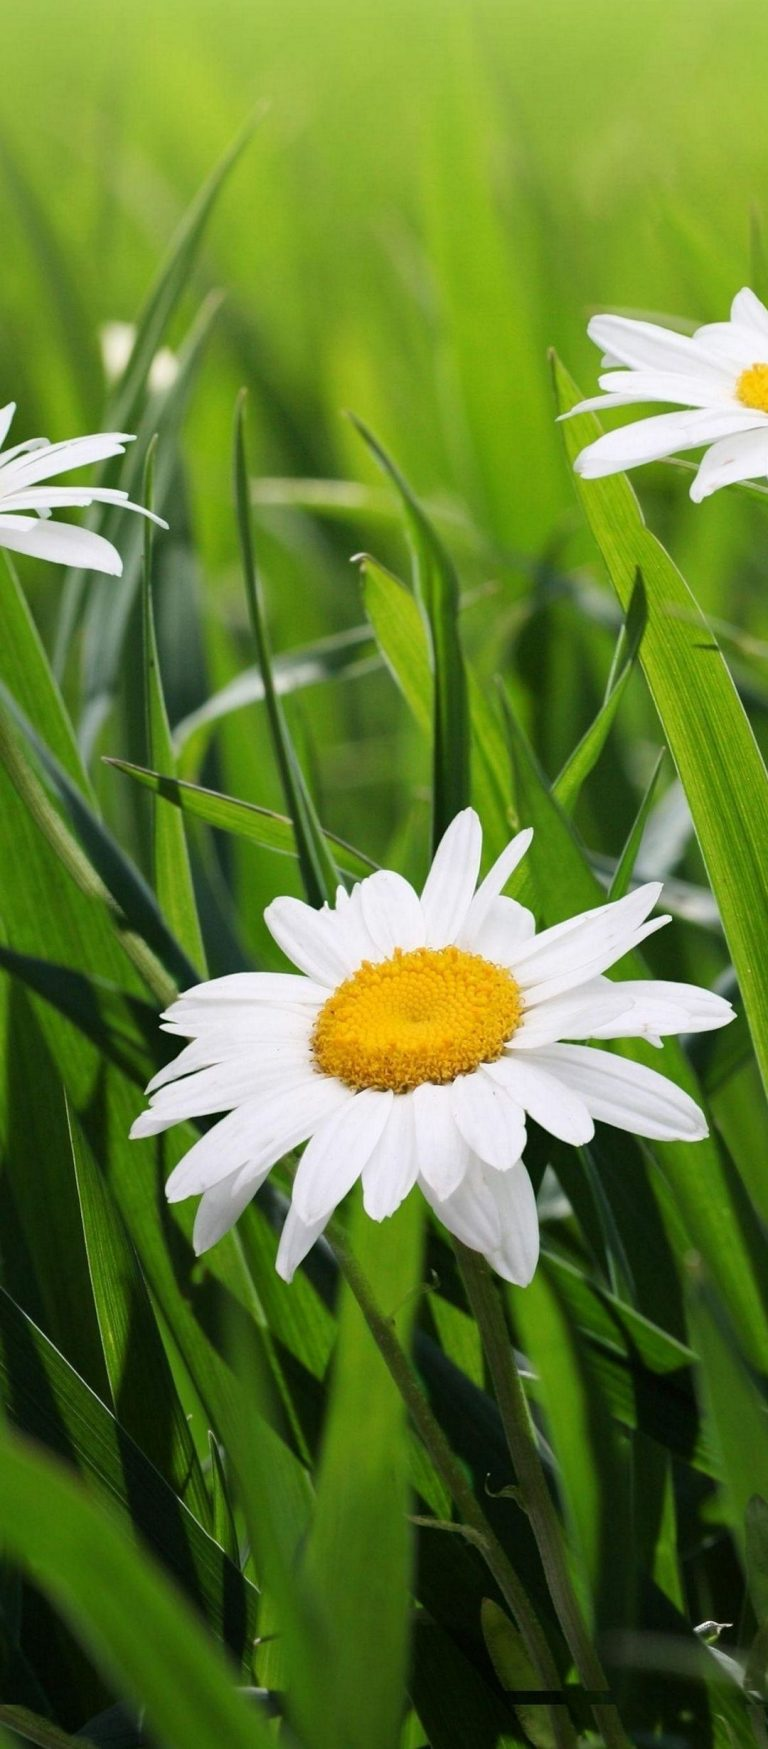 Daisies Flowers Grass Green Blur 1080x2460 768x1749